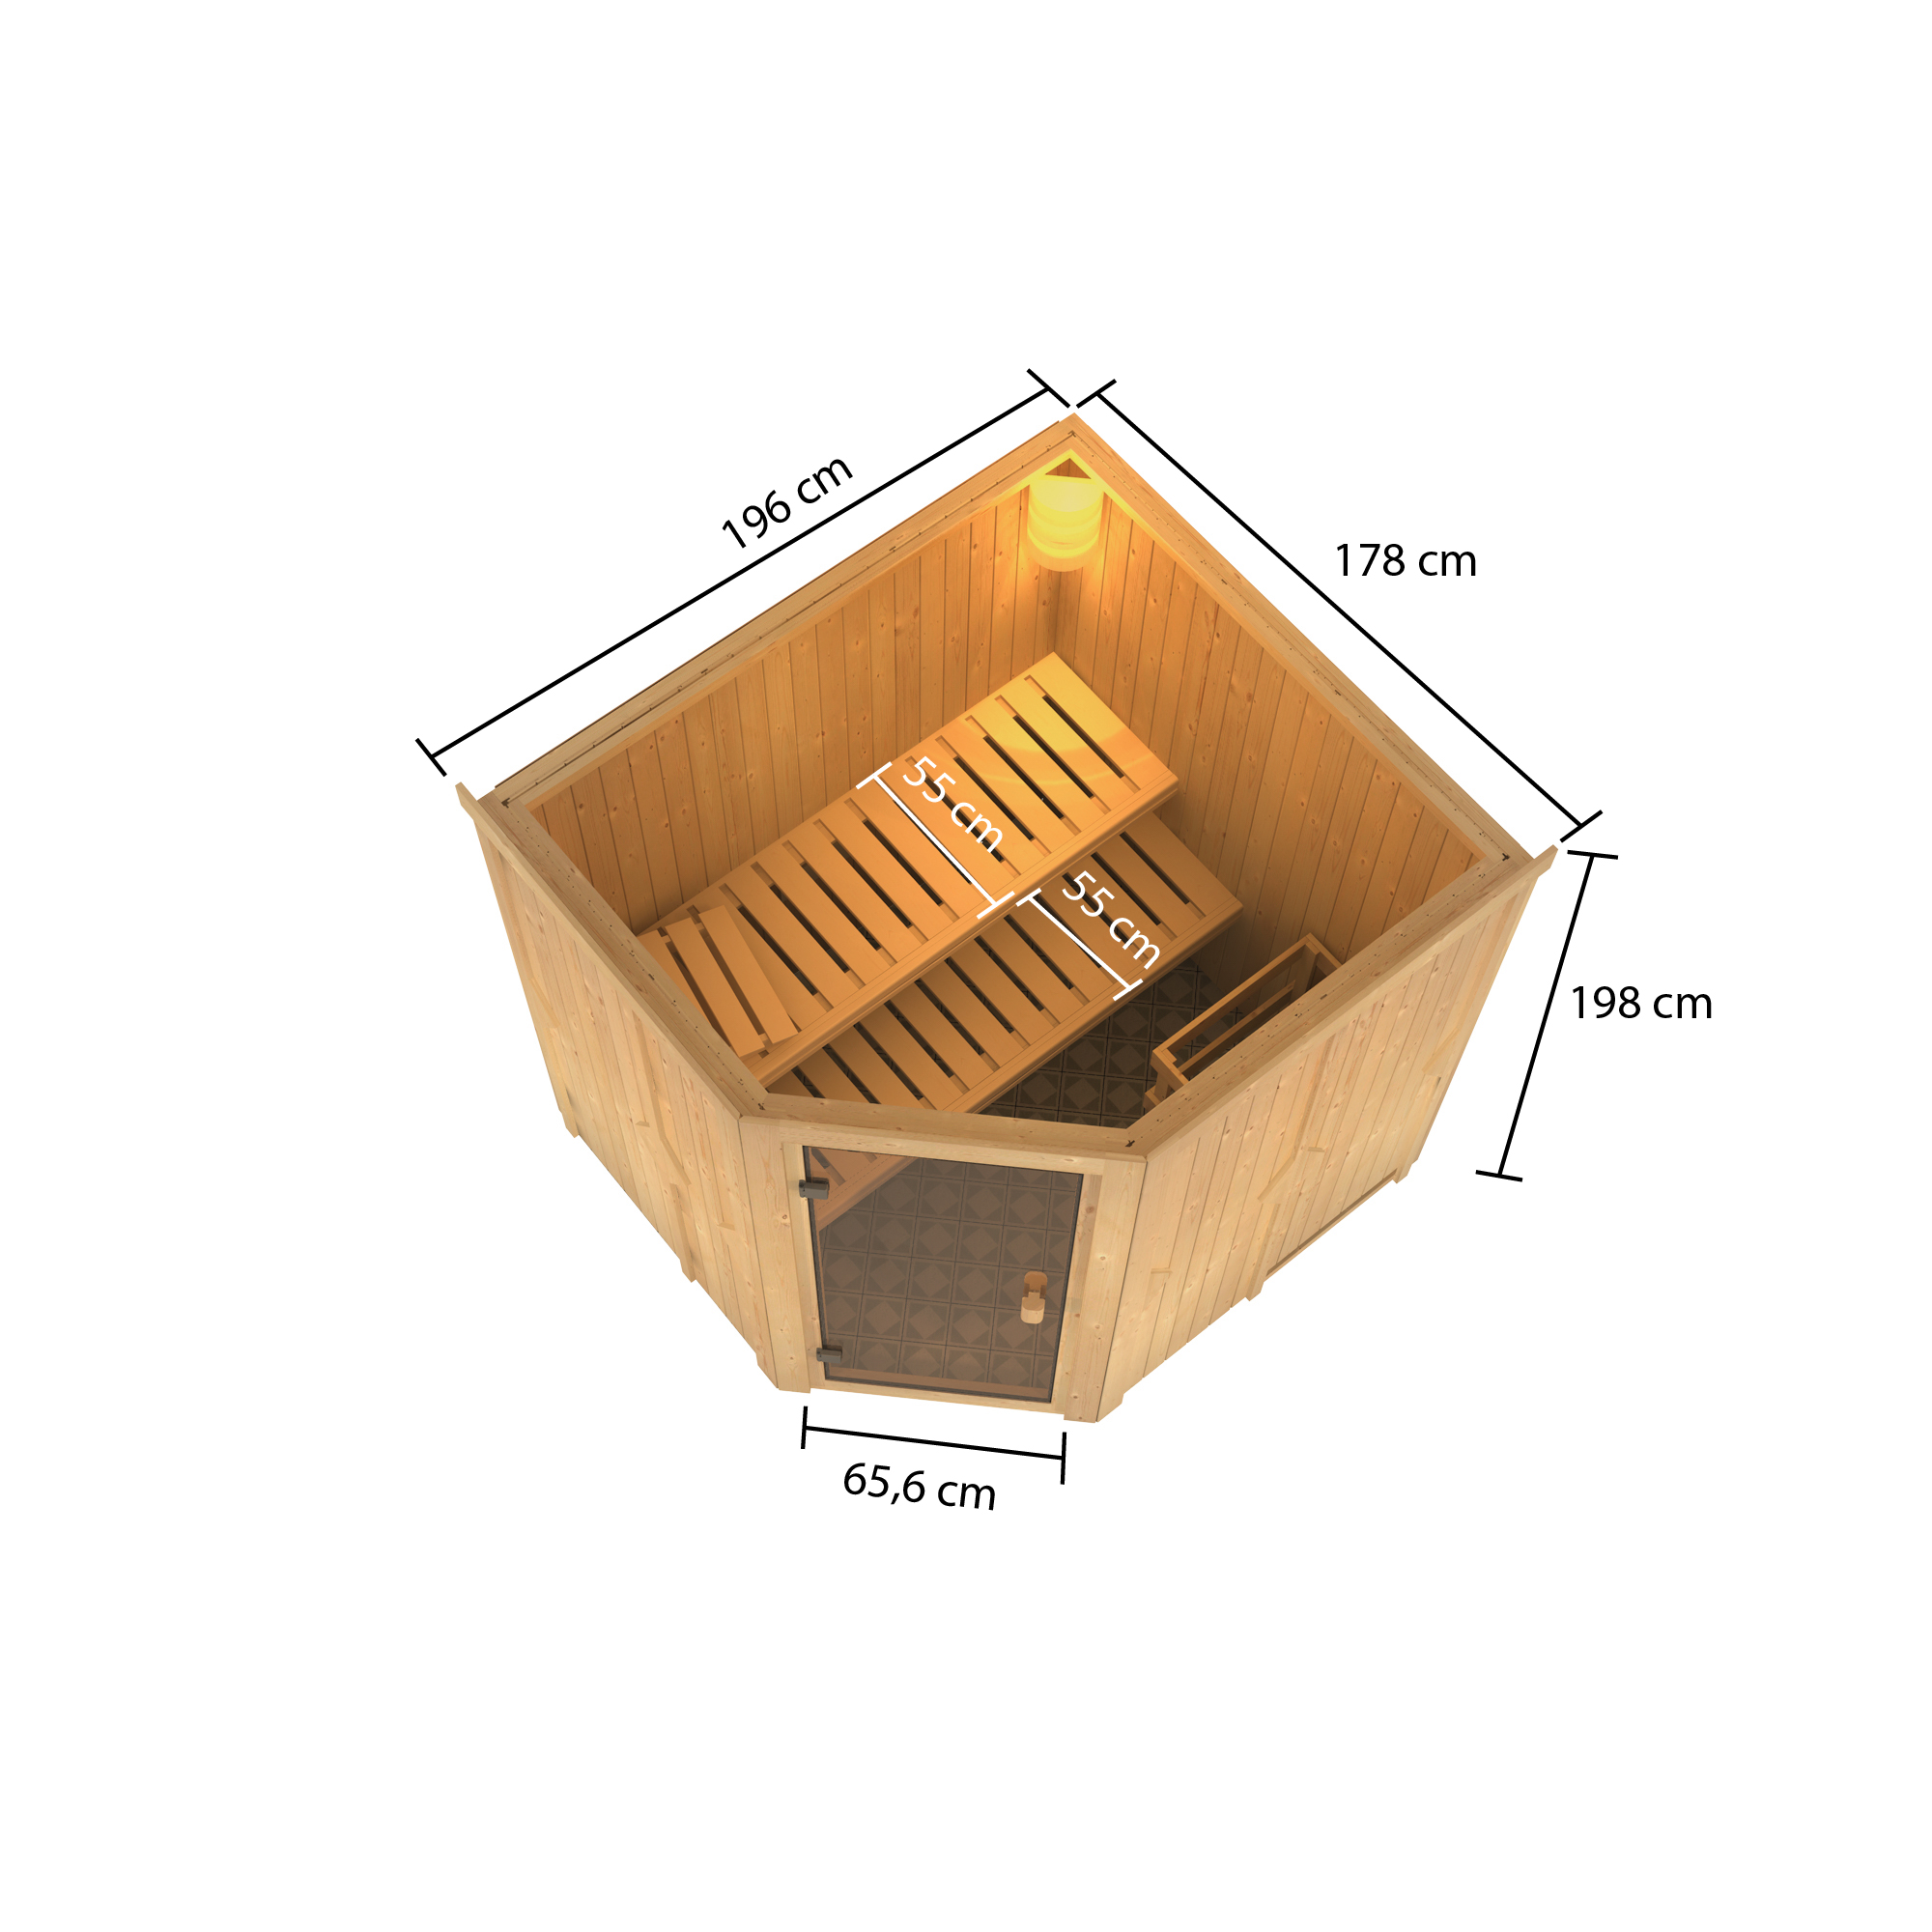 Woodfeeling Sauna Bodo 68mm Saunaofen 9kW intern Bild 7